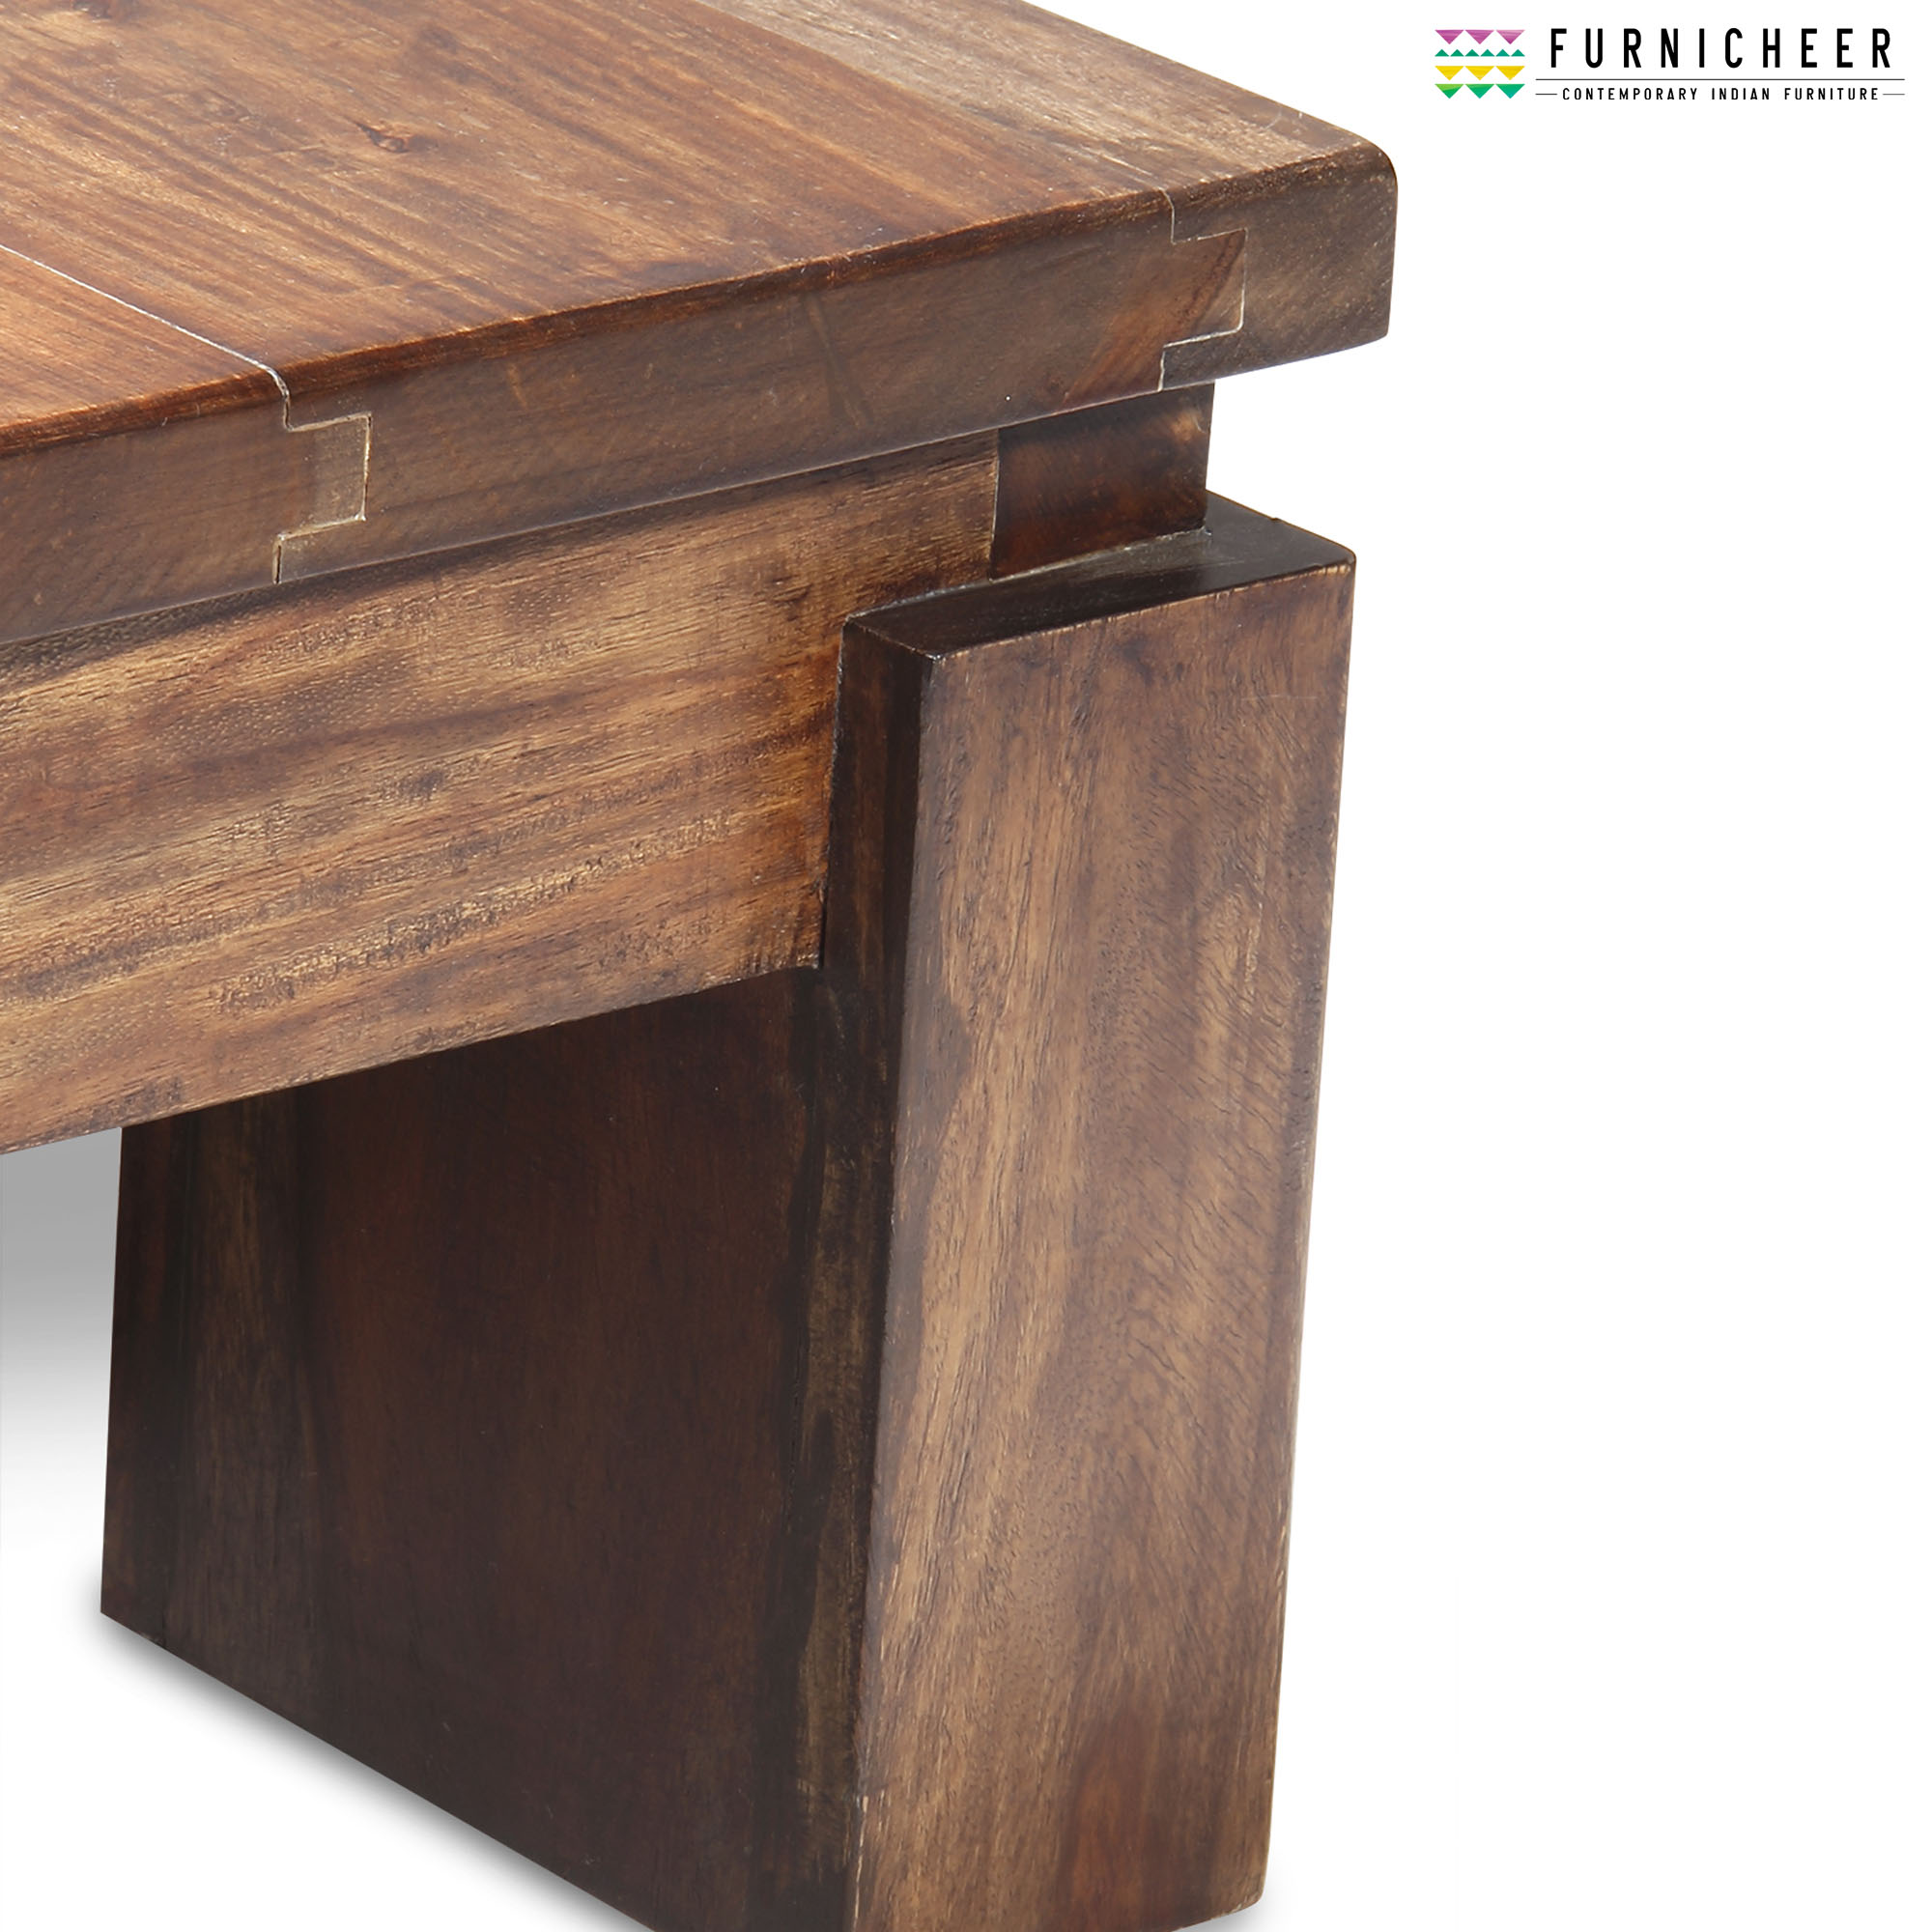 3.COFFEE TABLE SKU TBWL7112